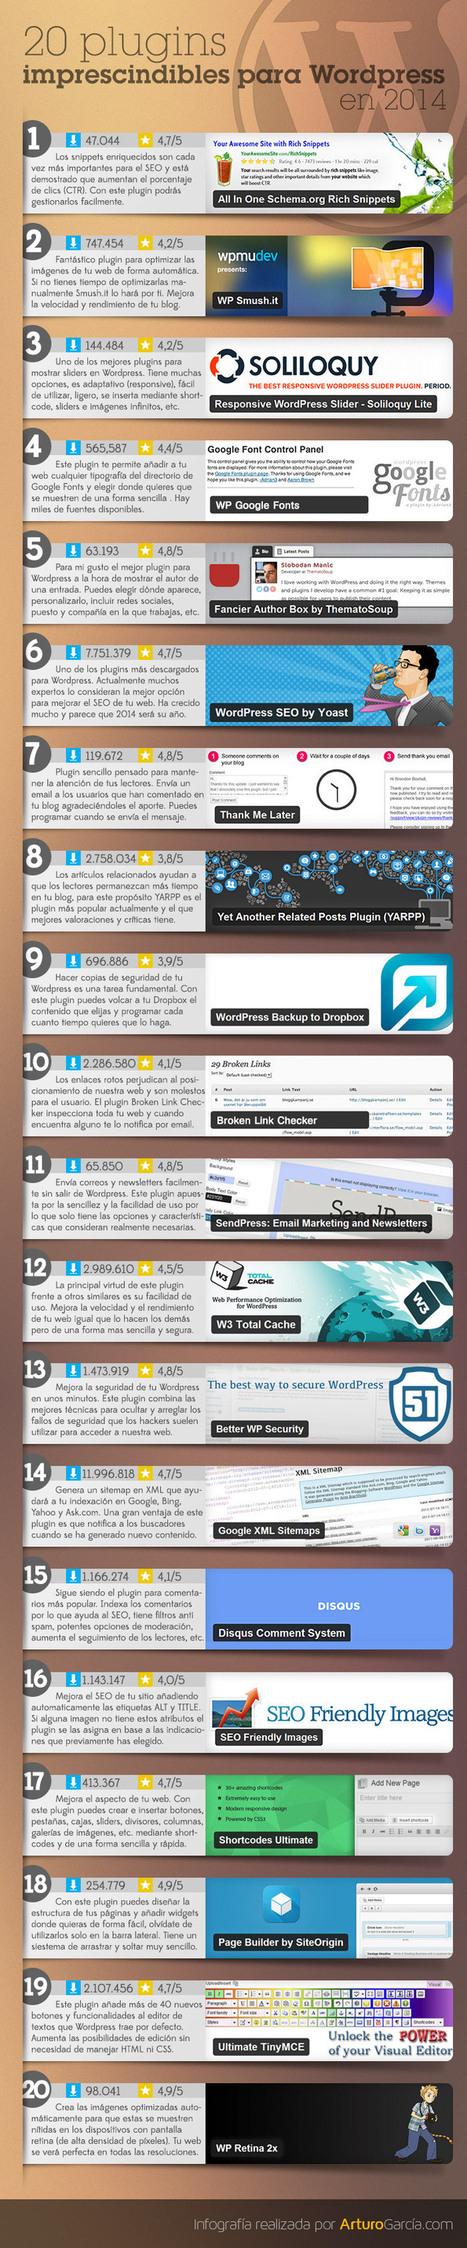 20 plugins imprescindibles para Wordpress en 2014 (infografía) | SEO | Scoop.it